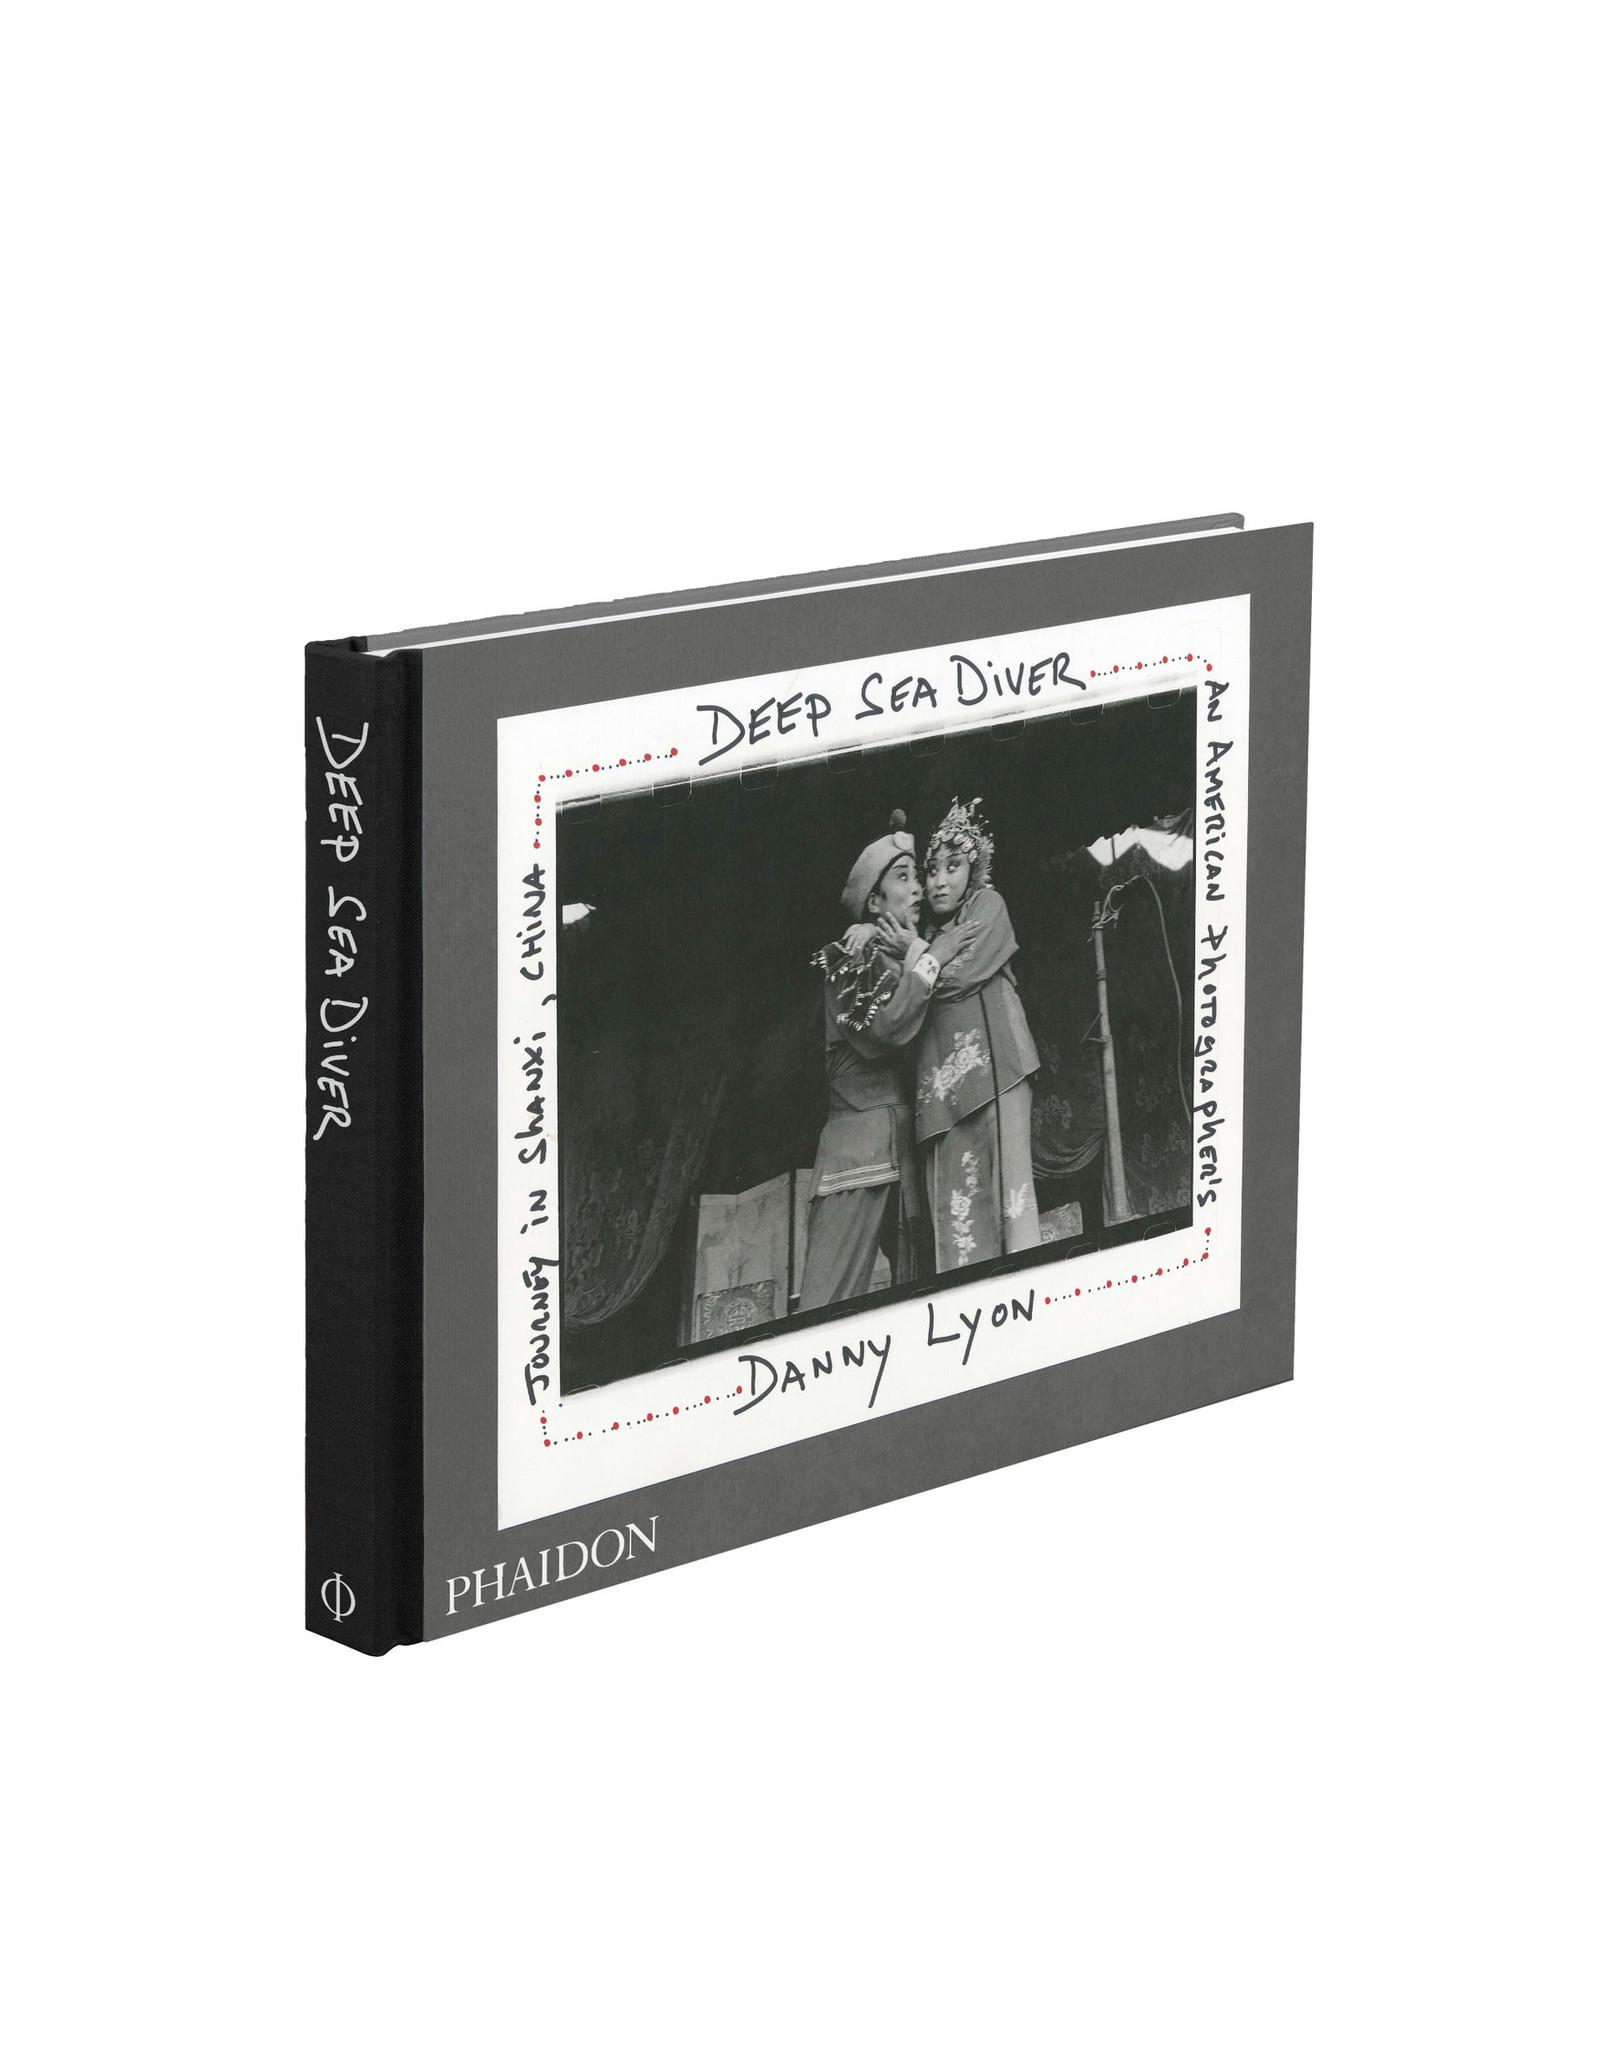 Danny Lyon: Deep Sea Diver, Limited Edition